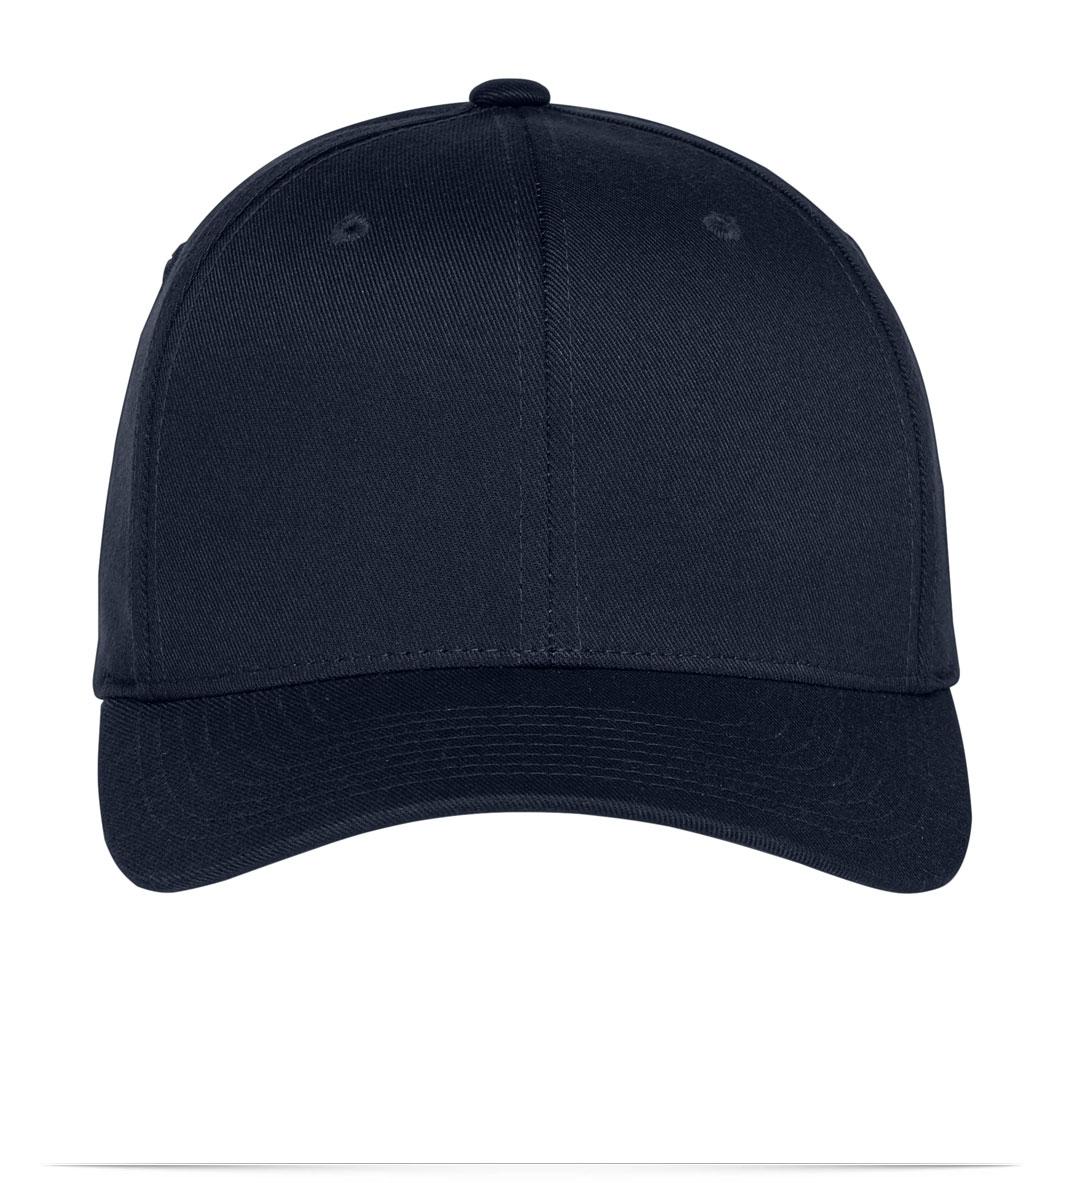 Design Custom Embroidered Logo Flexfit Cap Online at AllStar Logo e298b8a46c2d